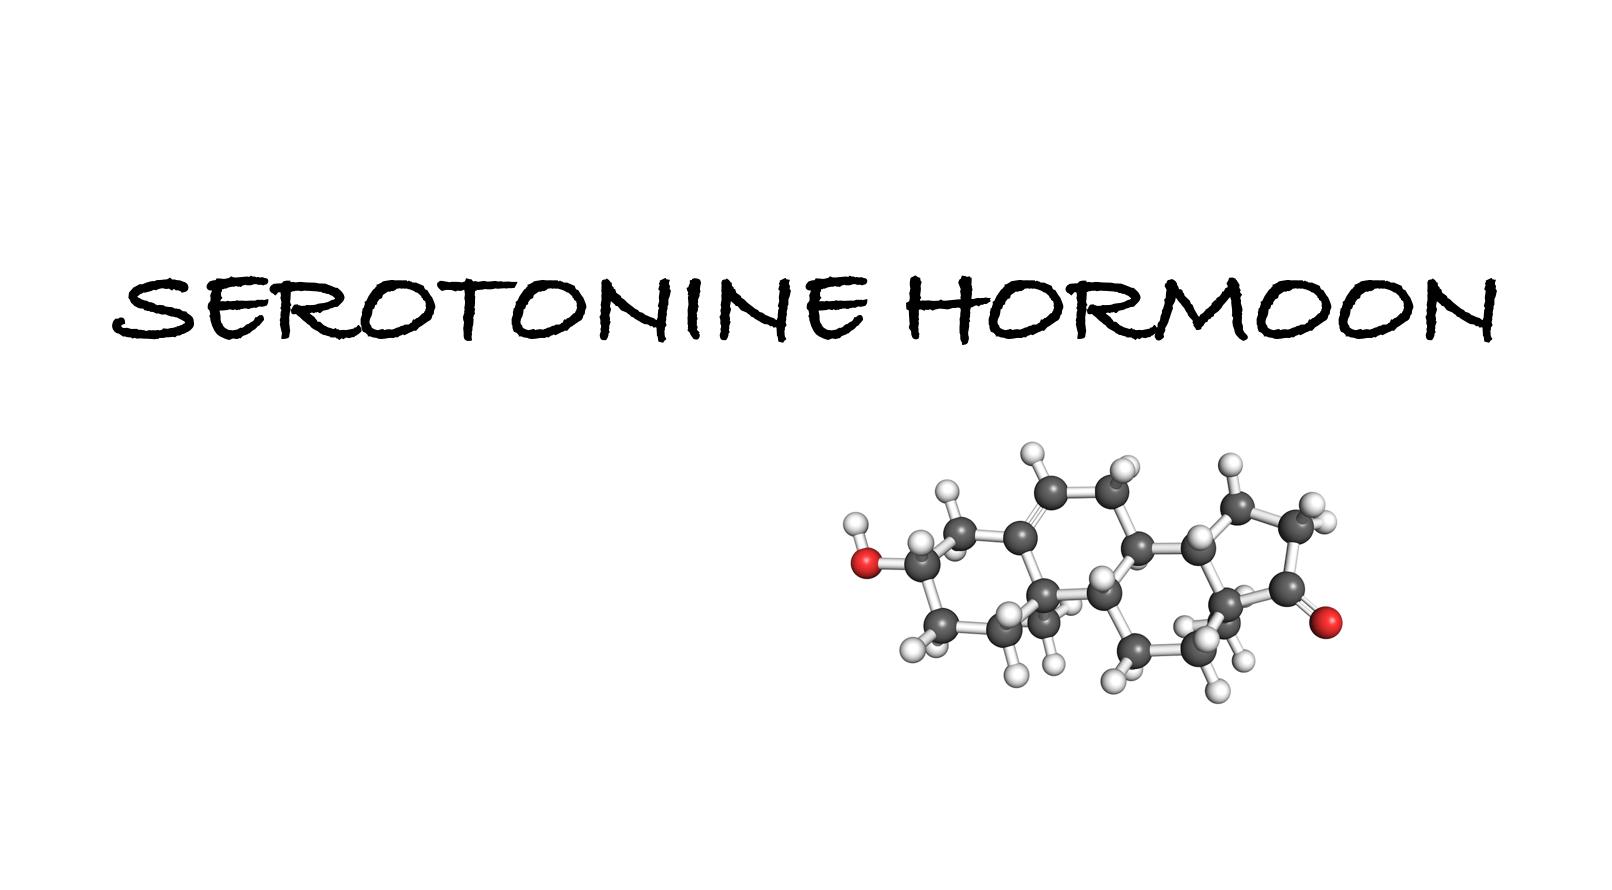 serotonine hormoon